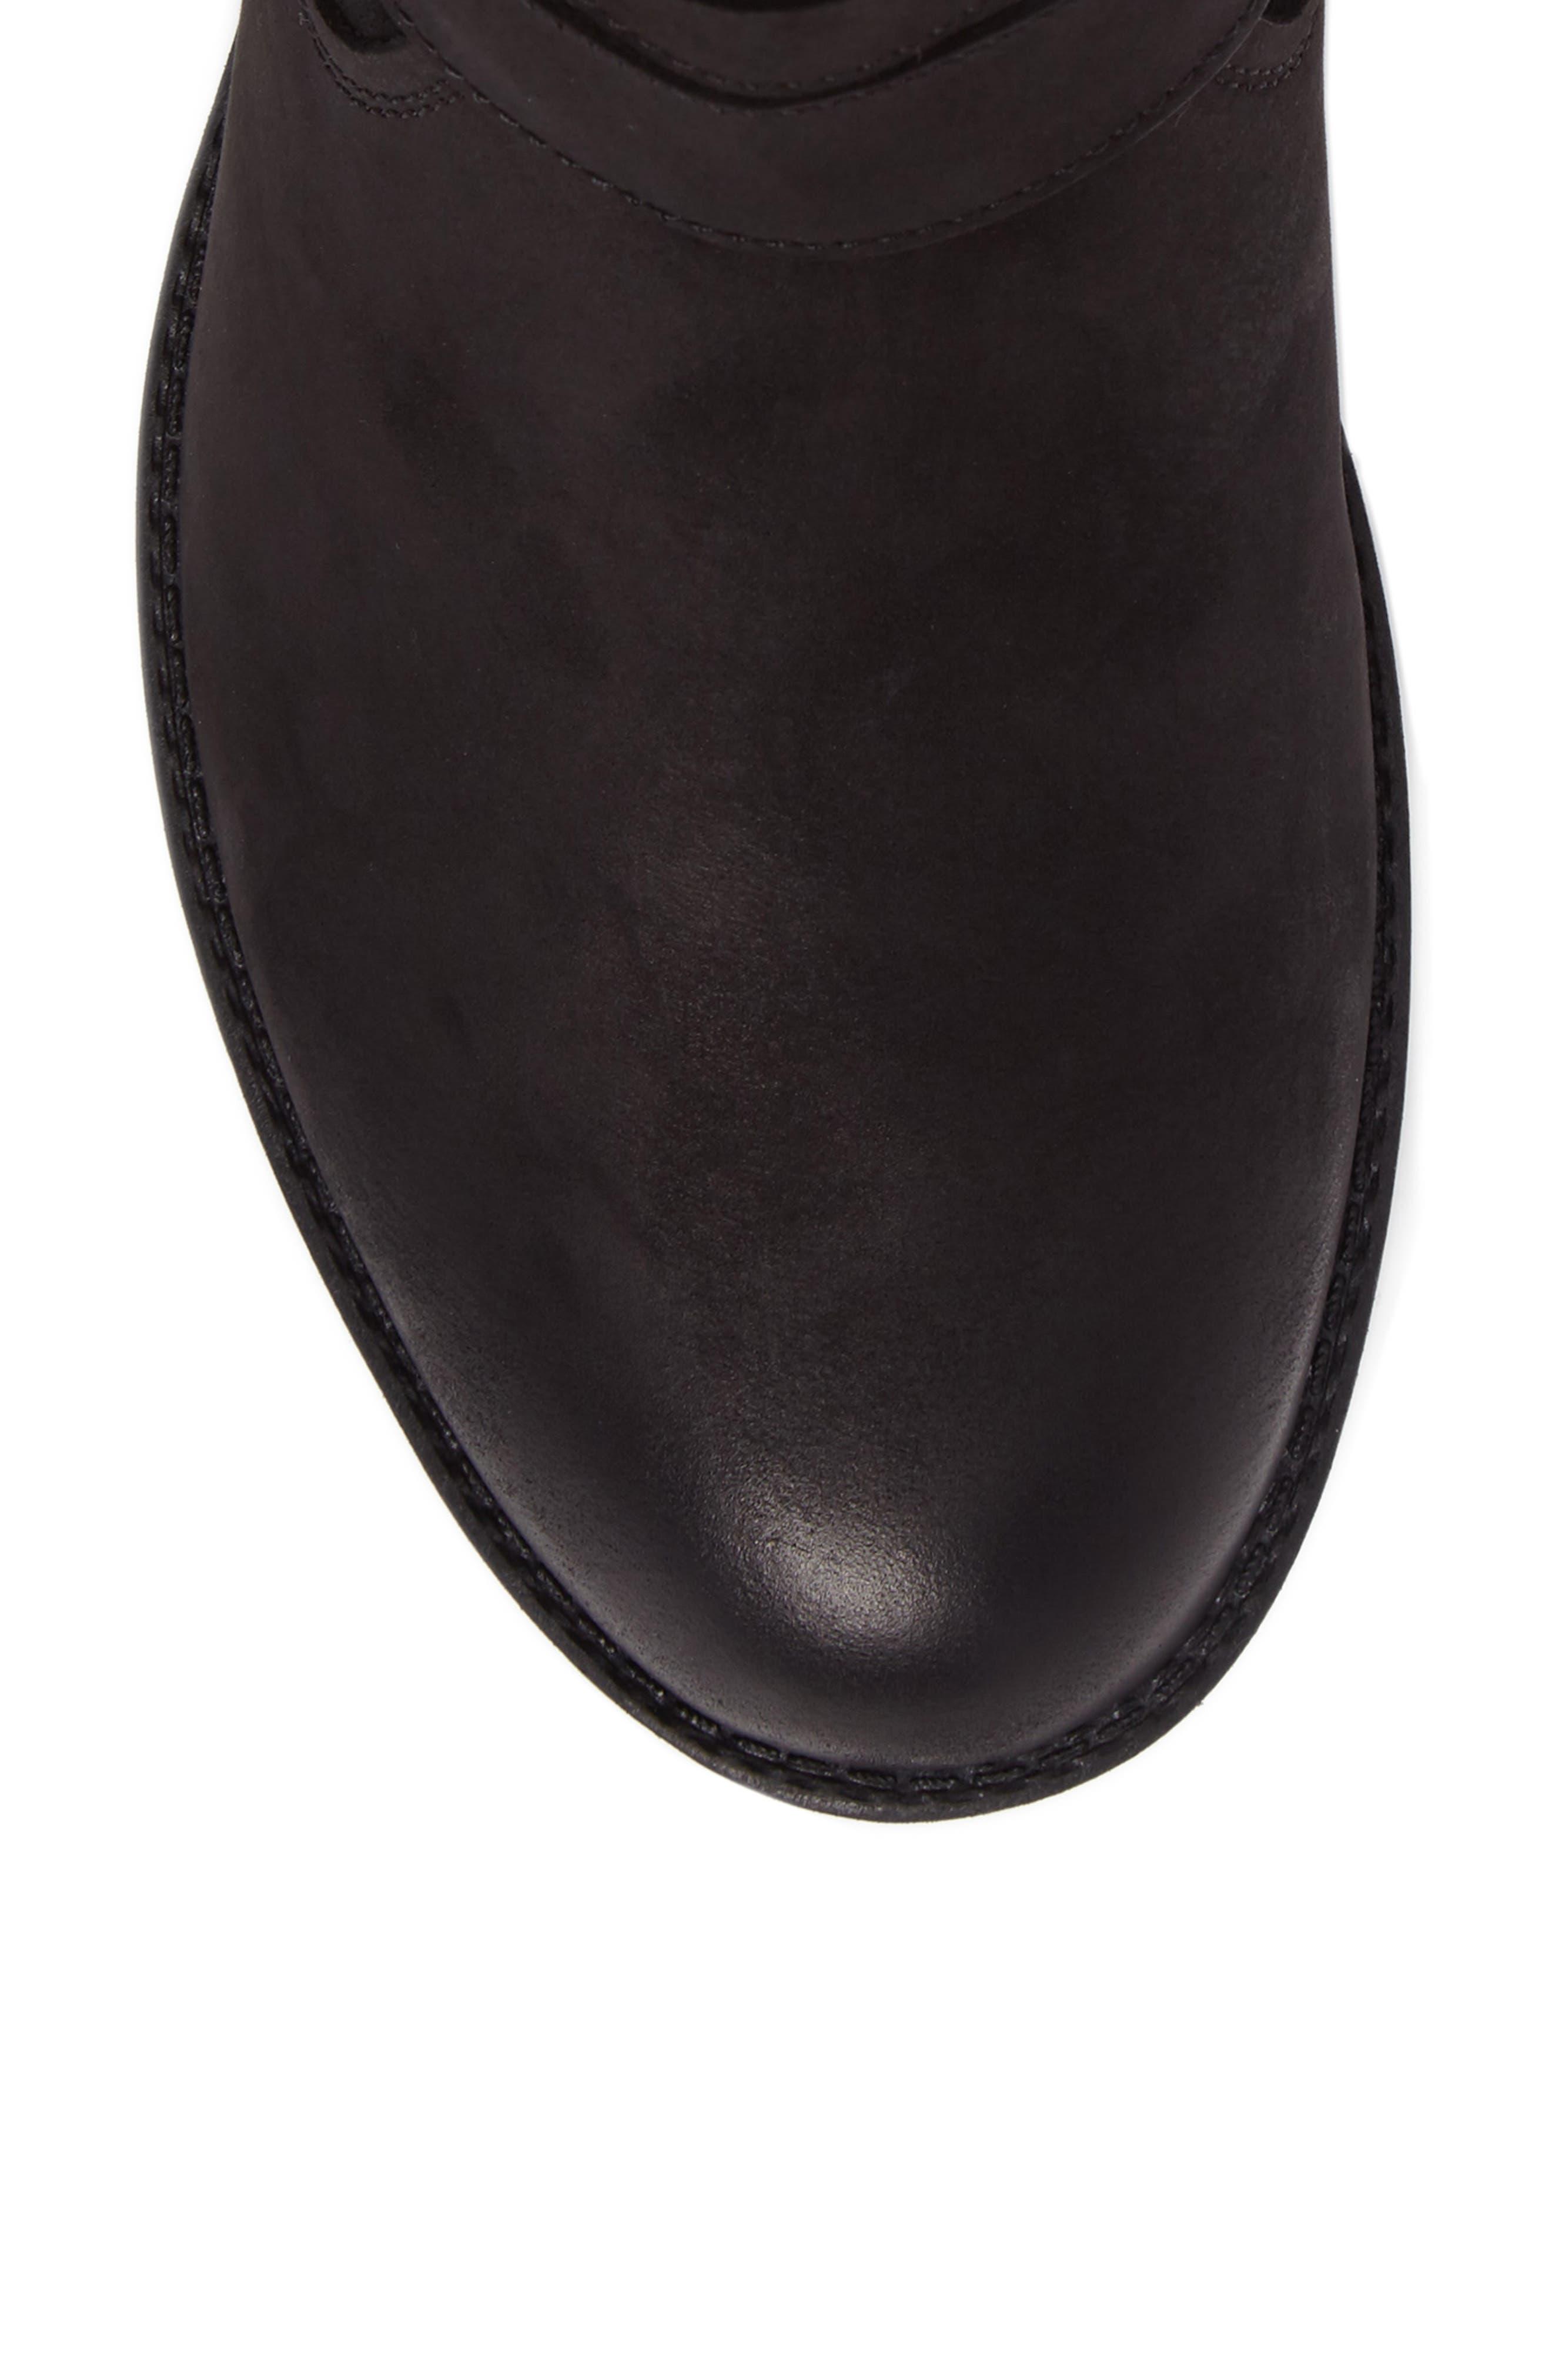 Tula Waterproof Boot,                             Alternate thumbnail 6, color,                             Black Nubuck Leather